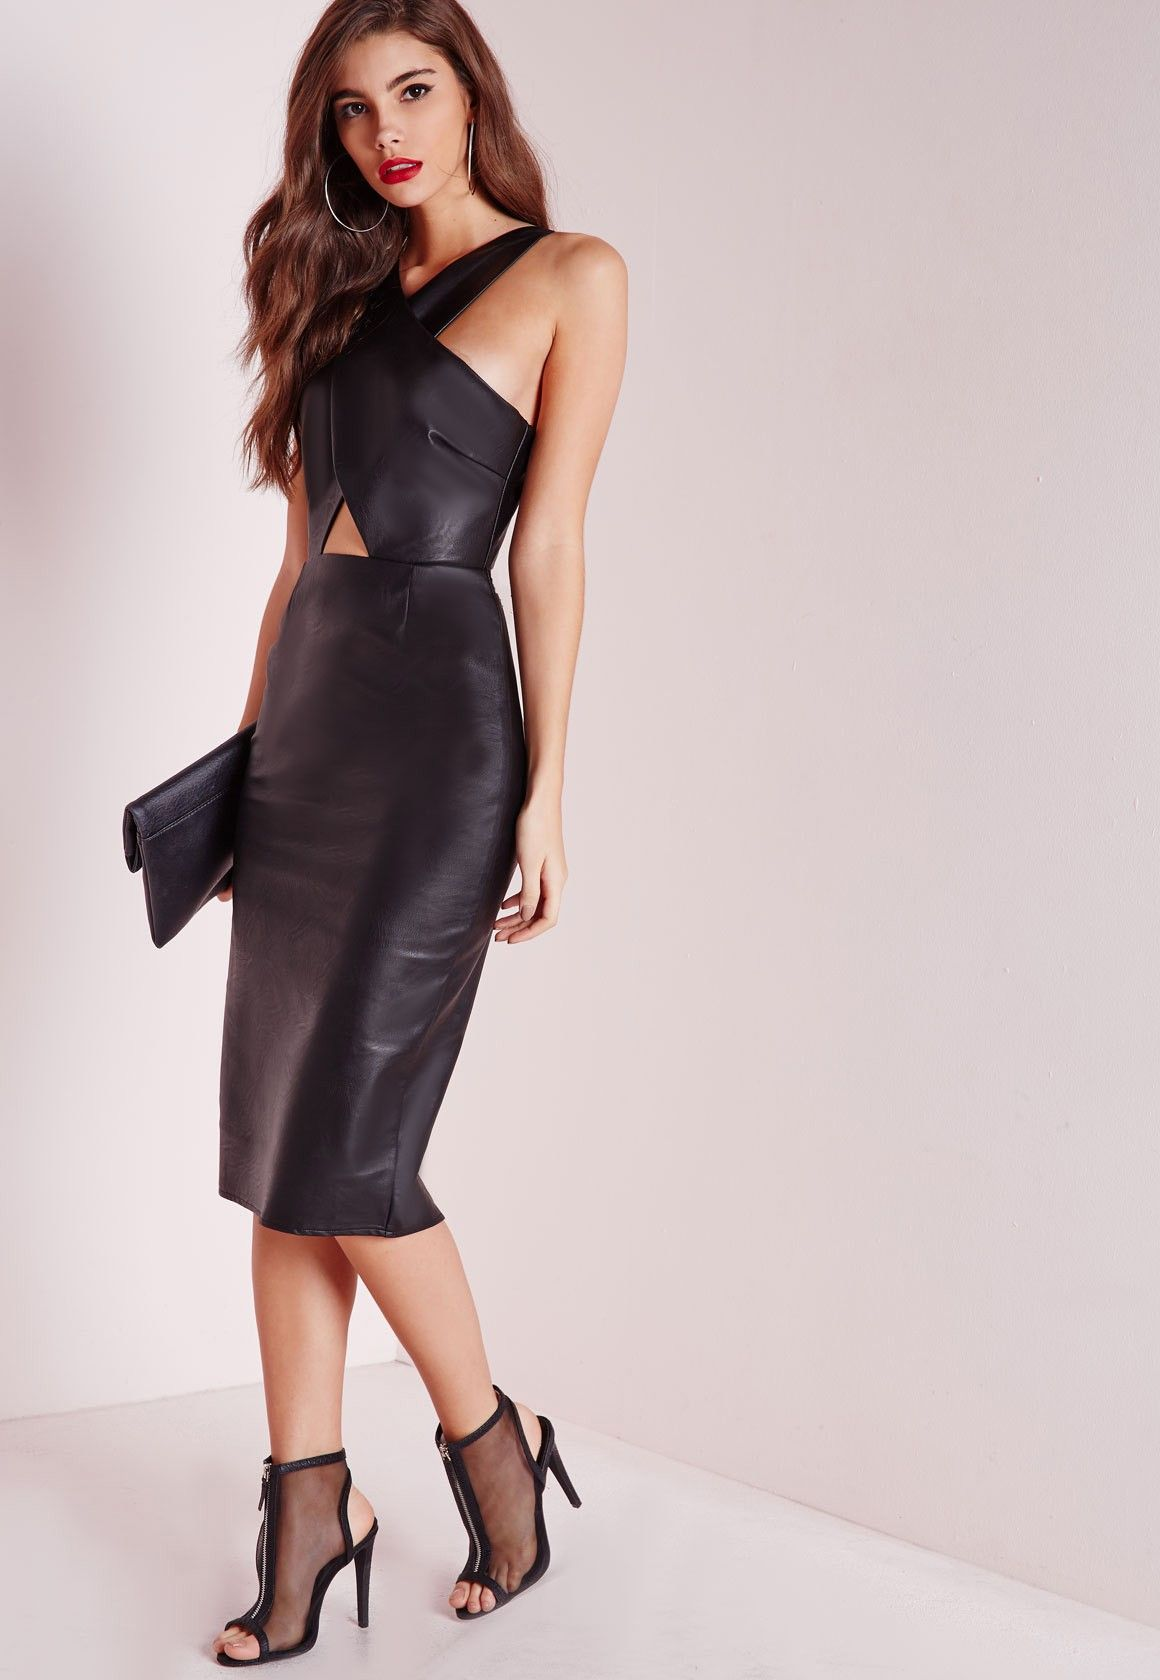 Black Leather Midi Bodycon Dress